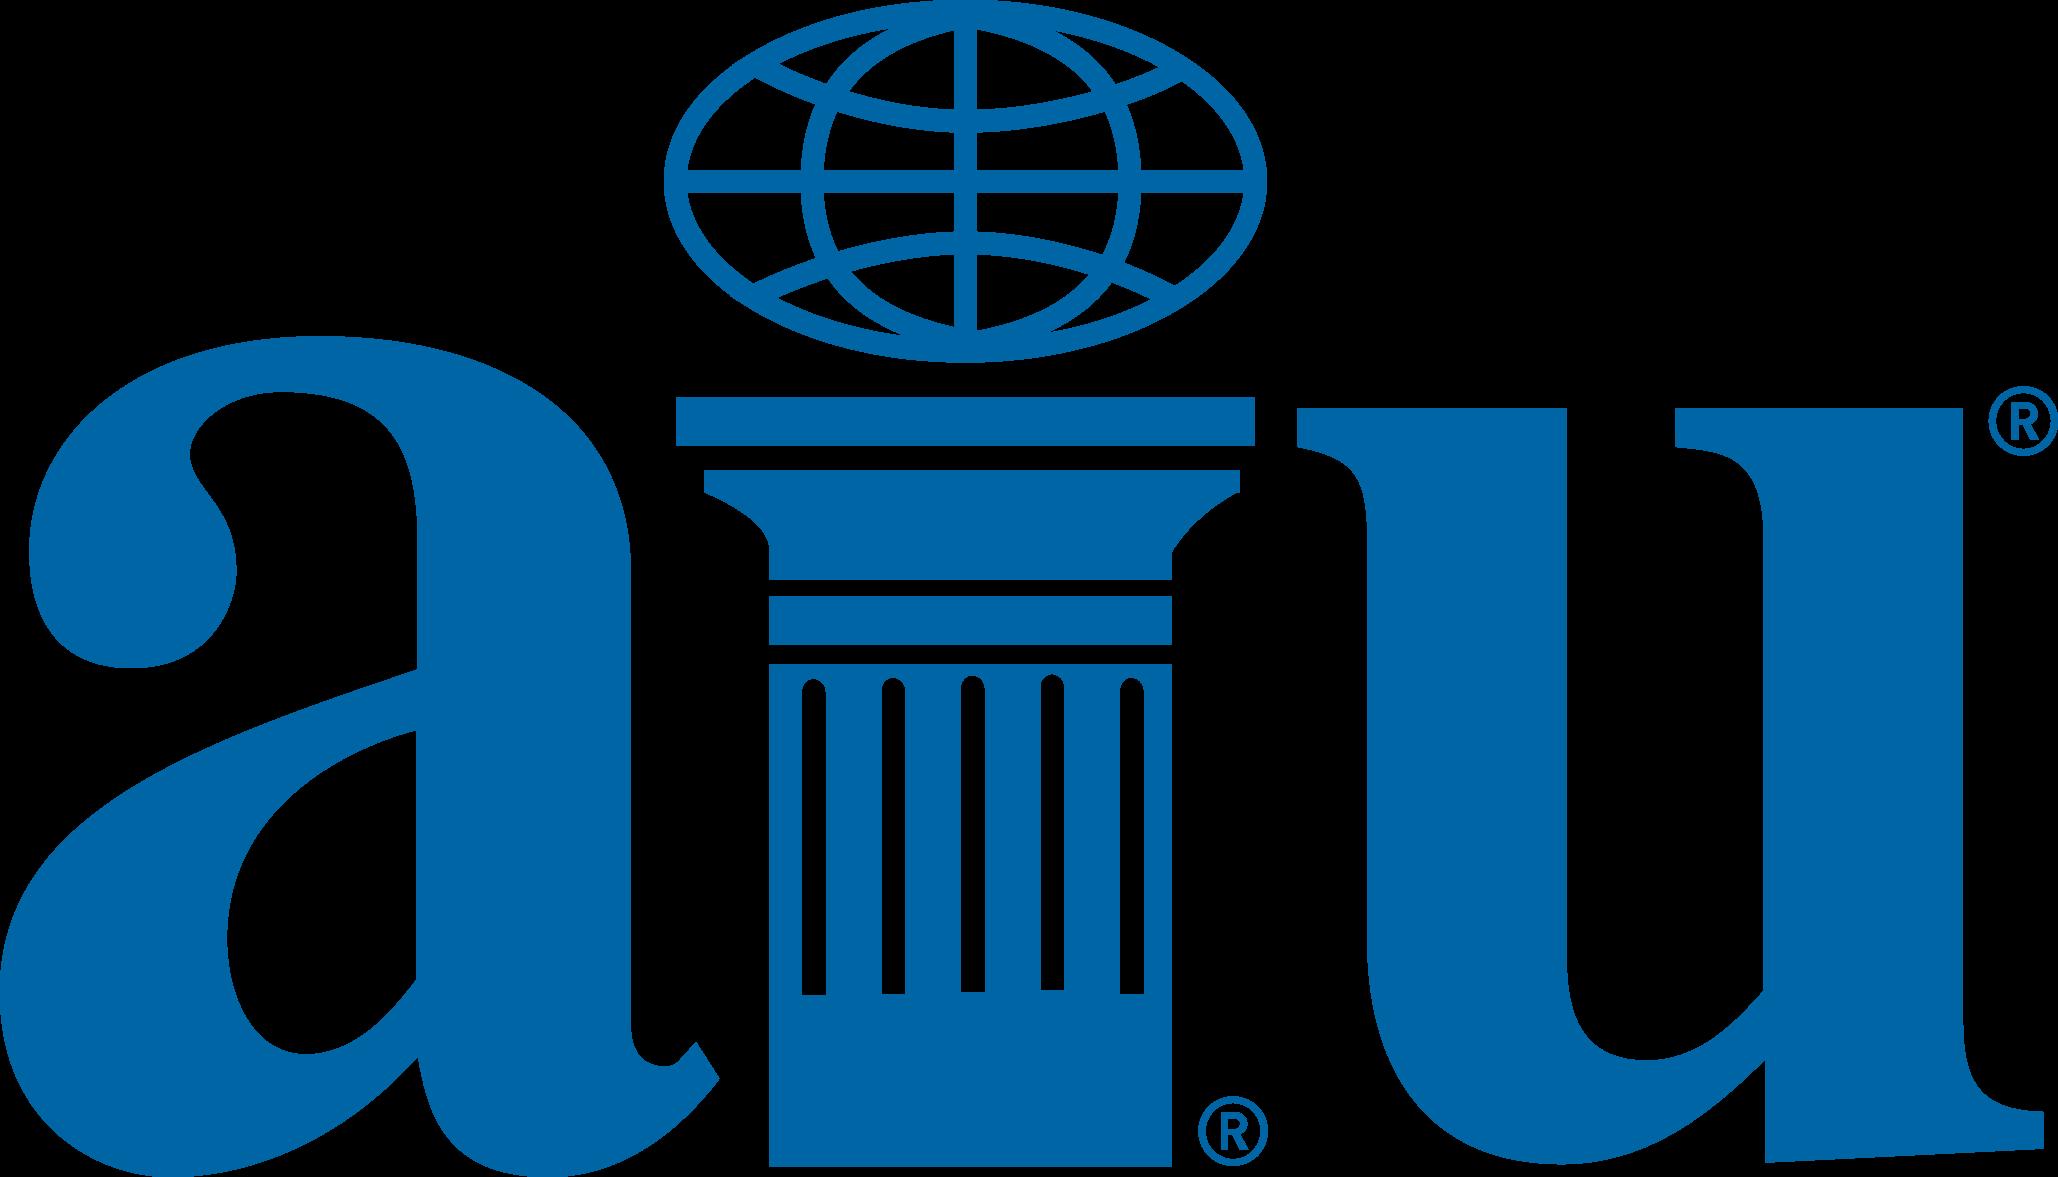 AIU Logo photo - 1